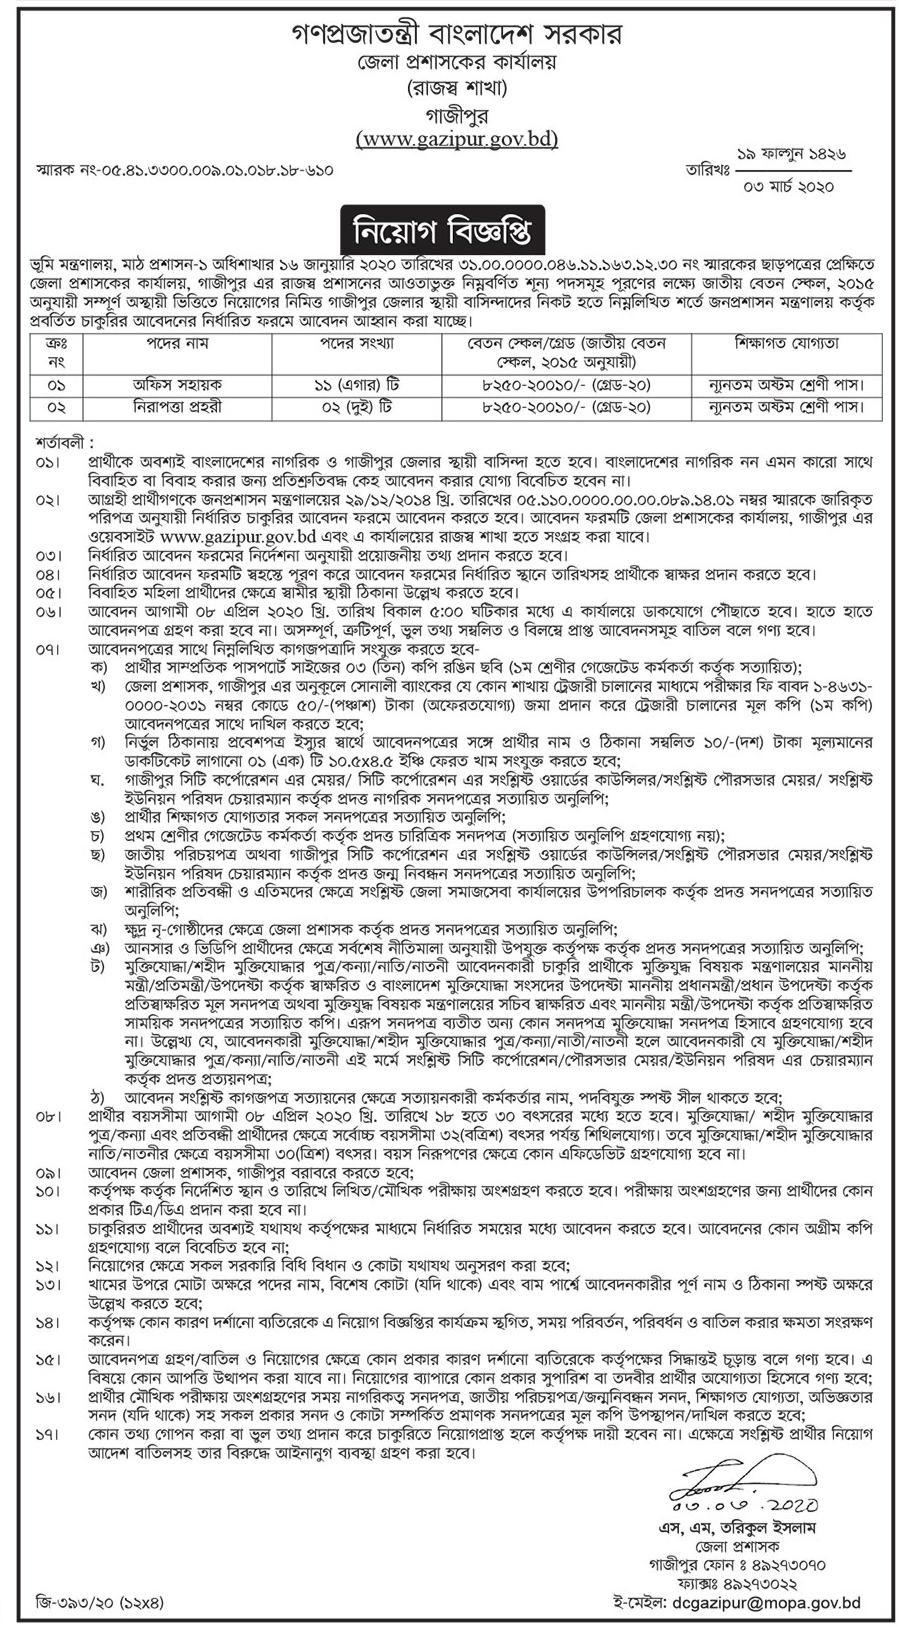 Gazipur Deputy Commissioner's Office Job Circular 2020